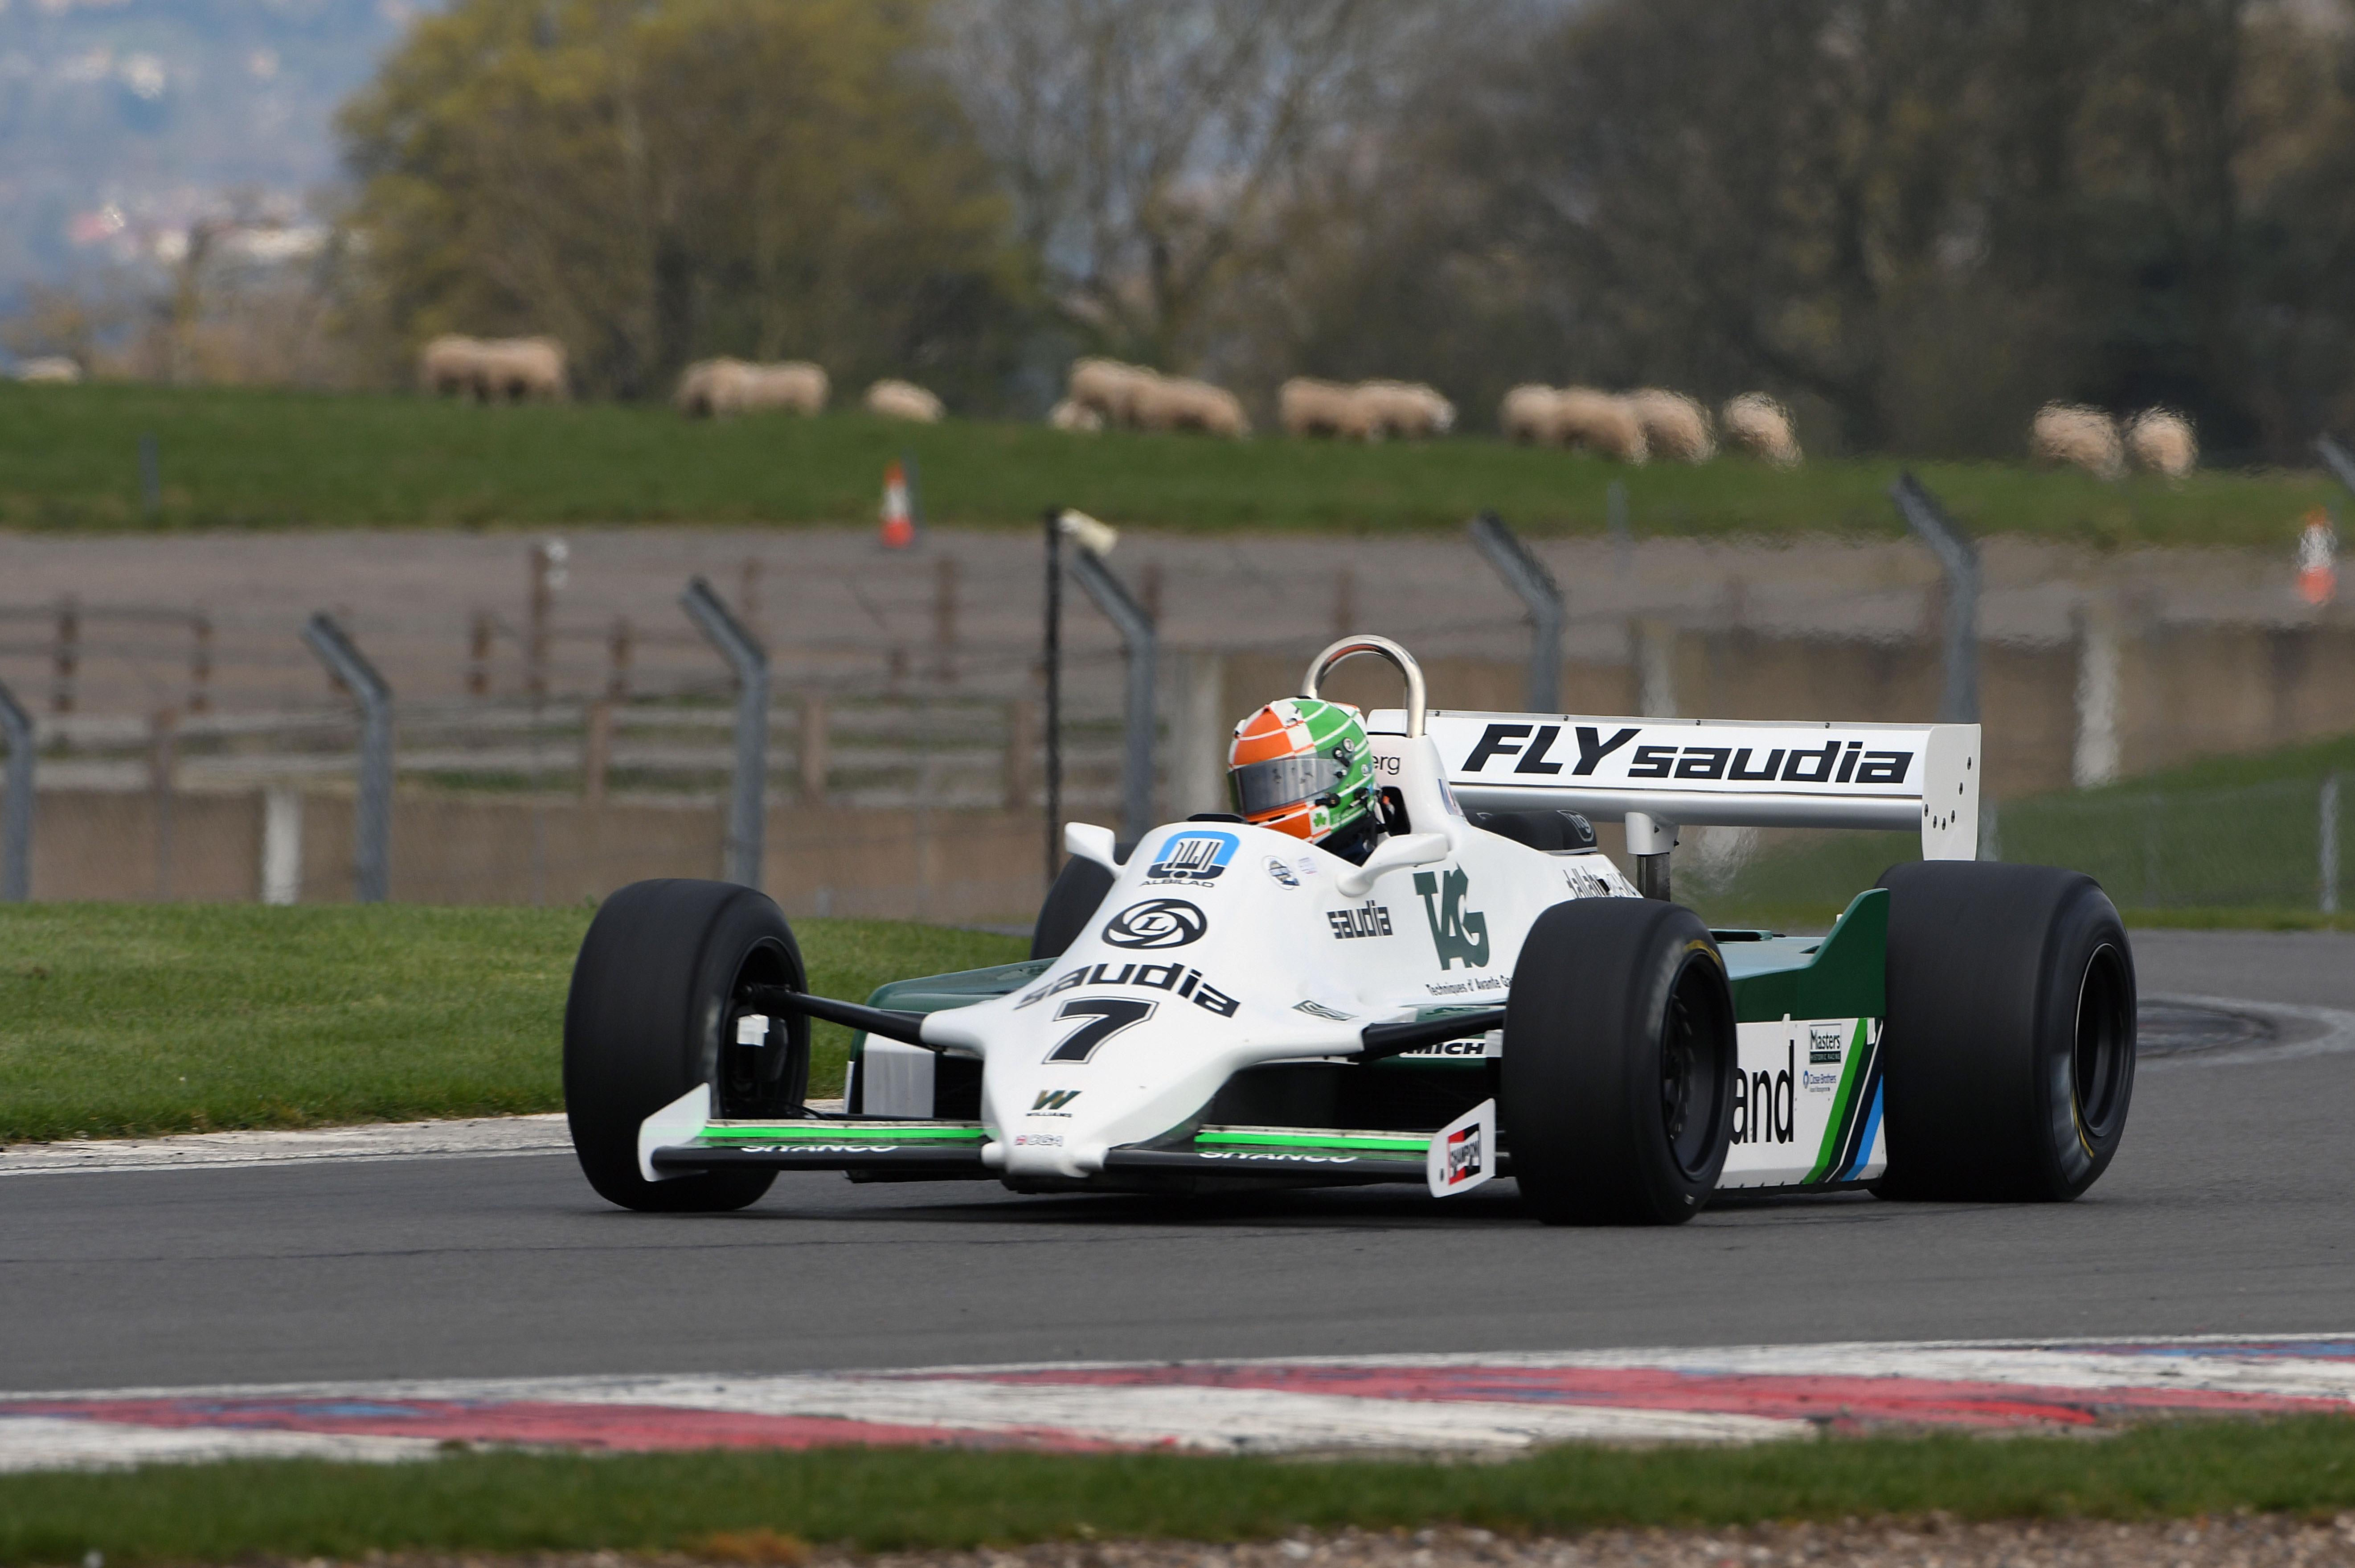 Williams F1 demo, Donington 2021